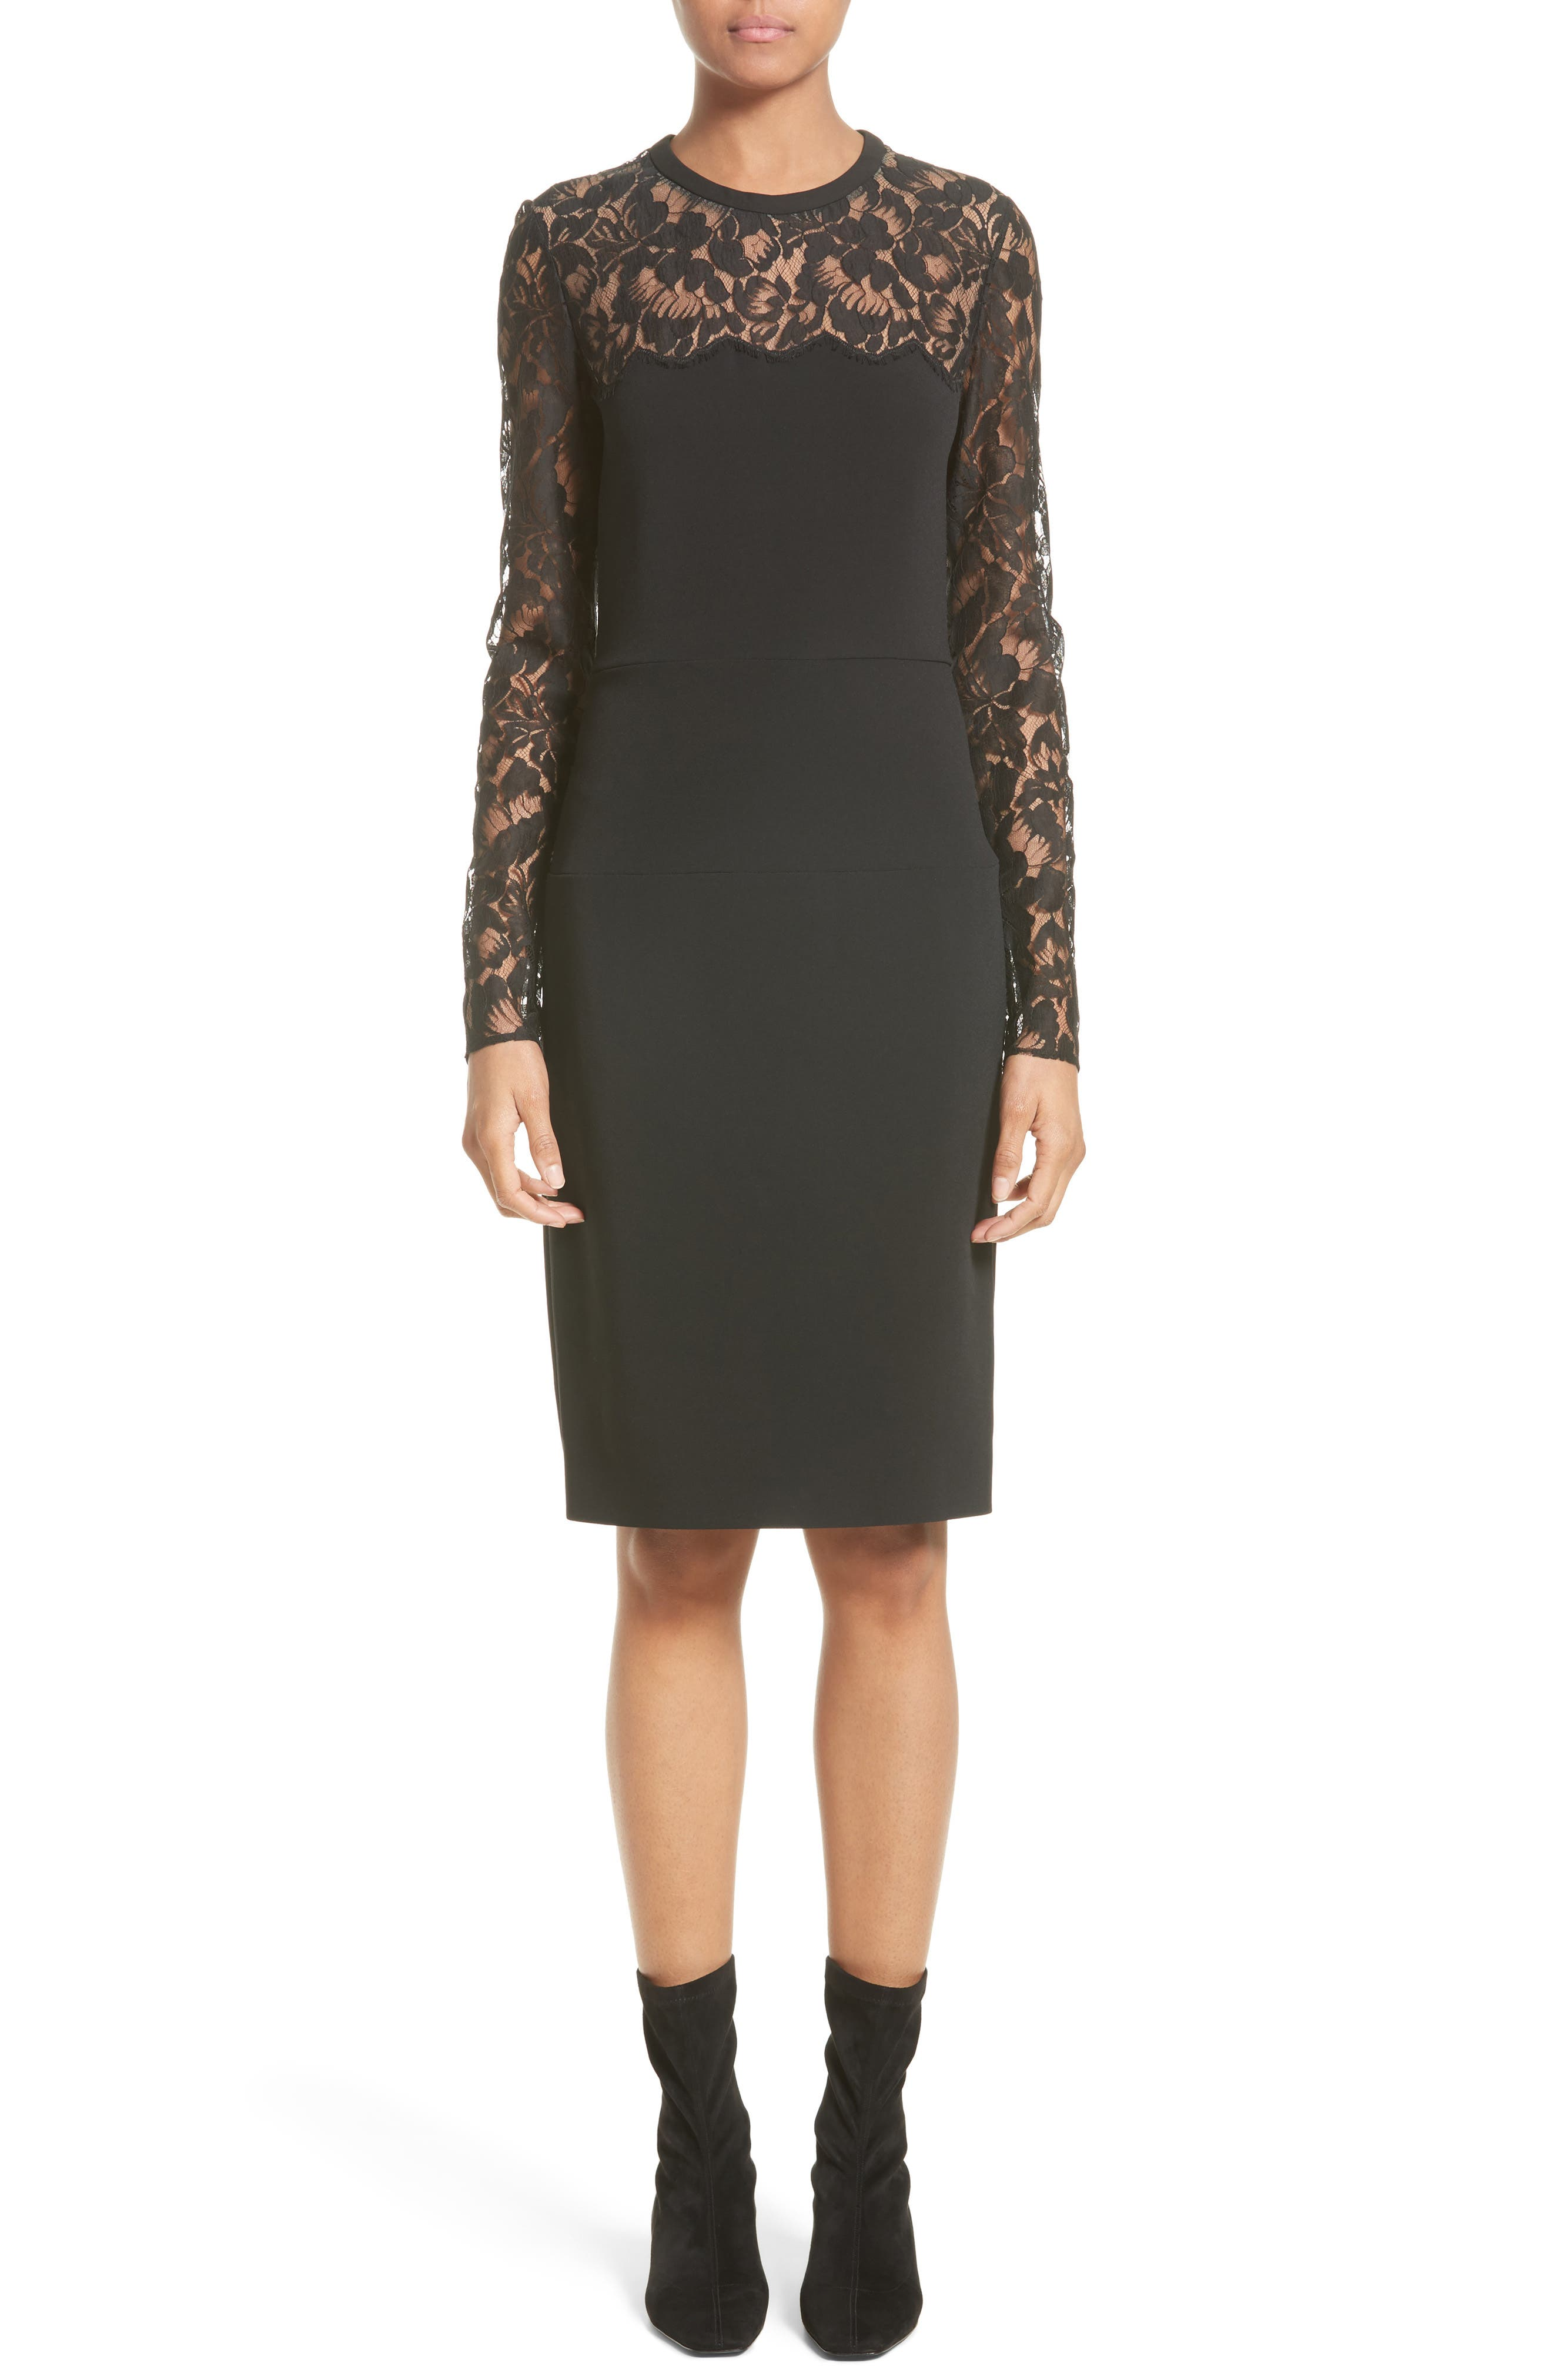 Alternate Image 1 Selected - Stella McCartney Lace Illusion Sheath Dress